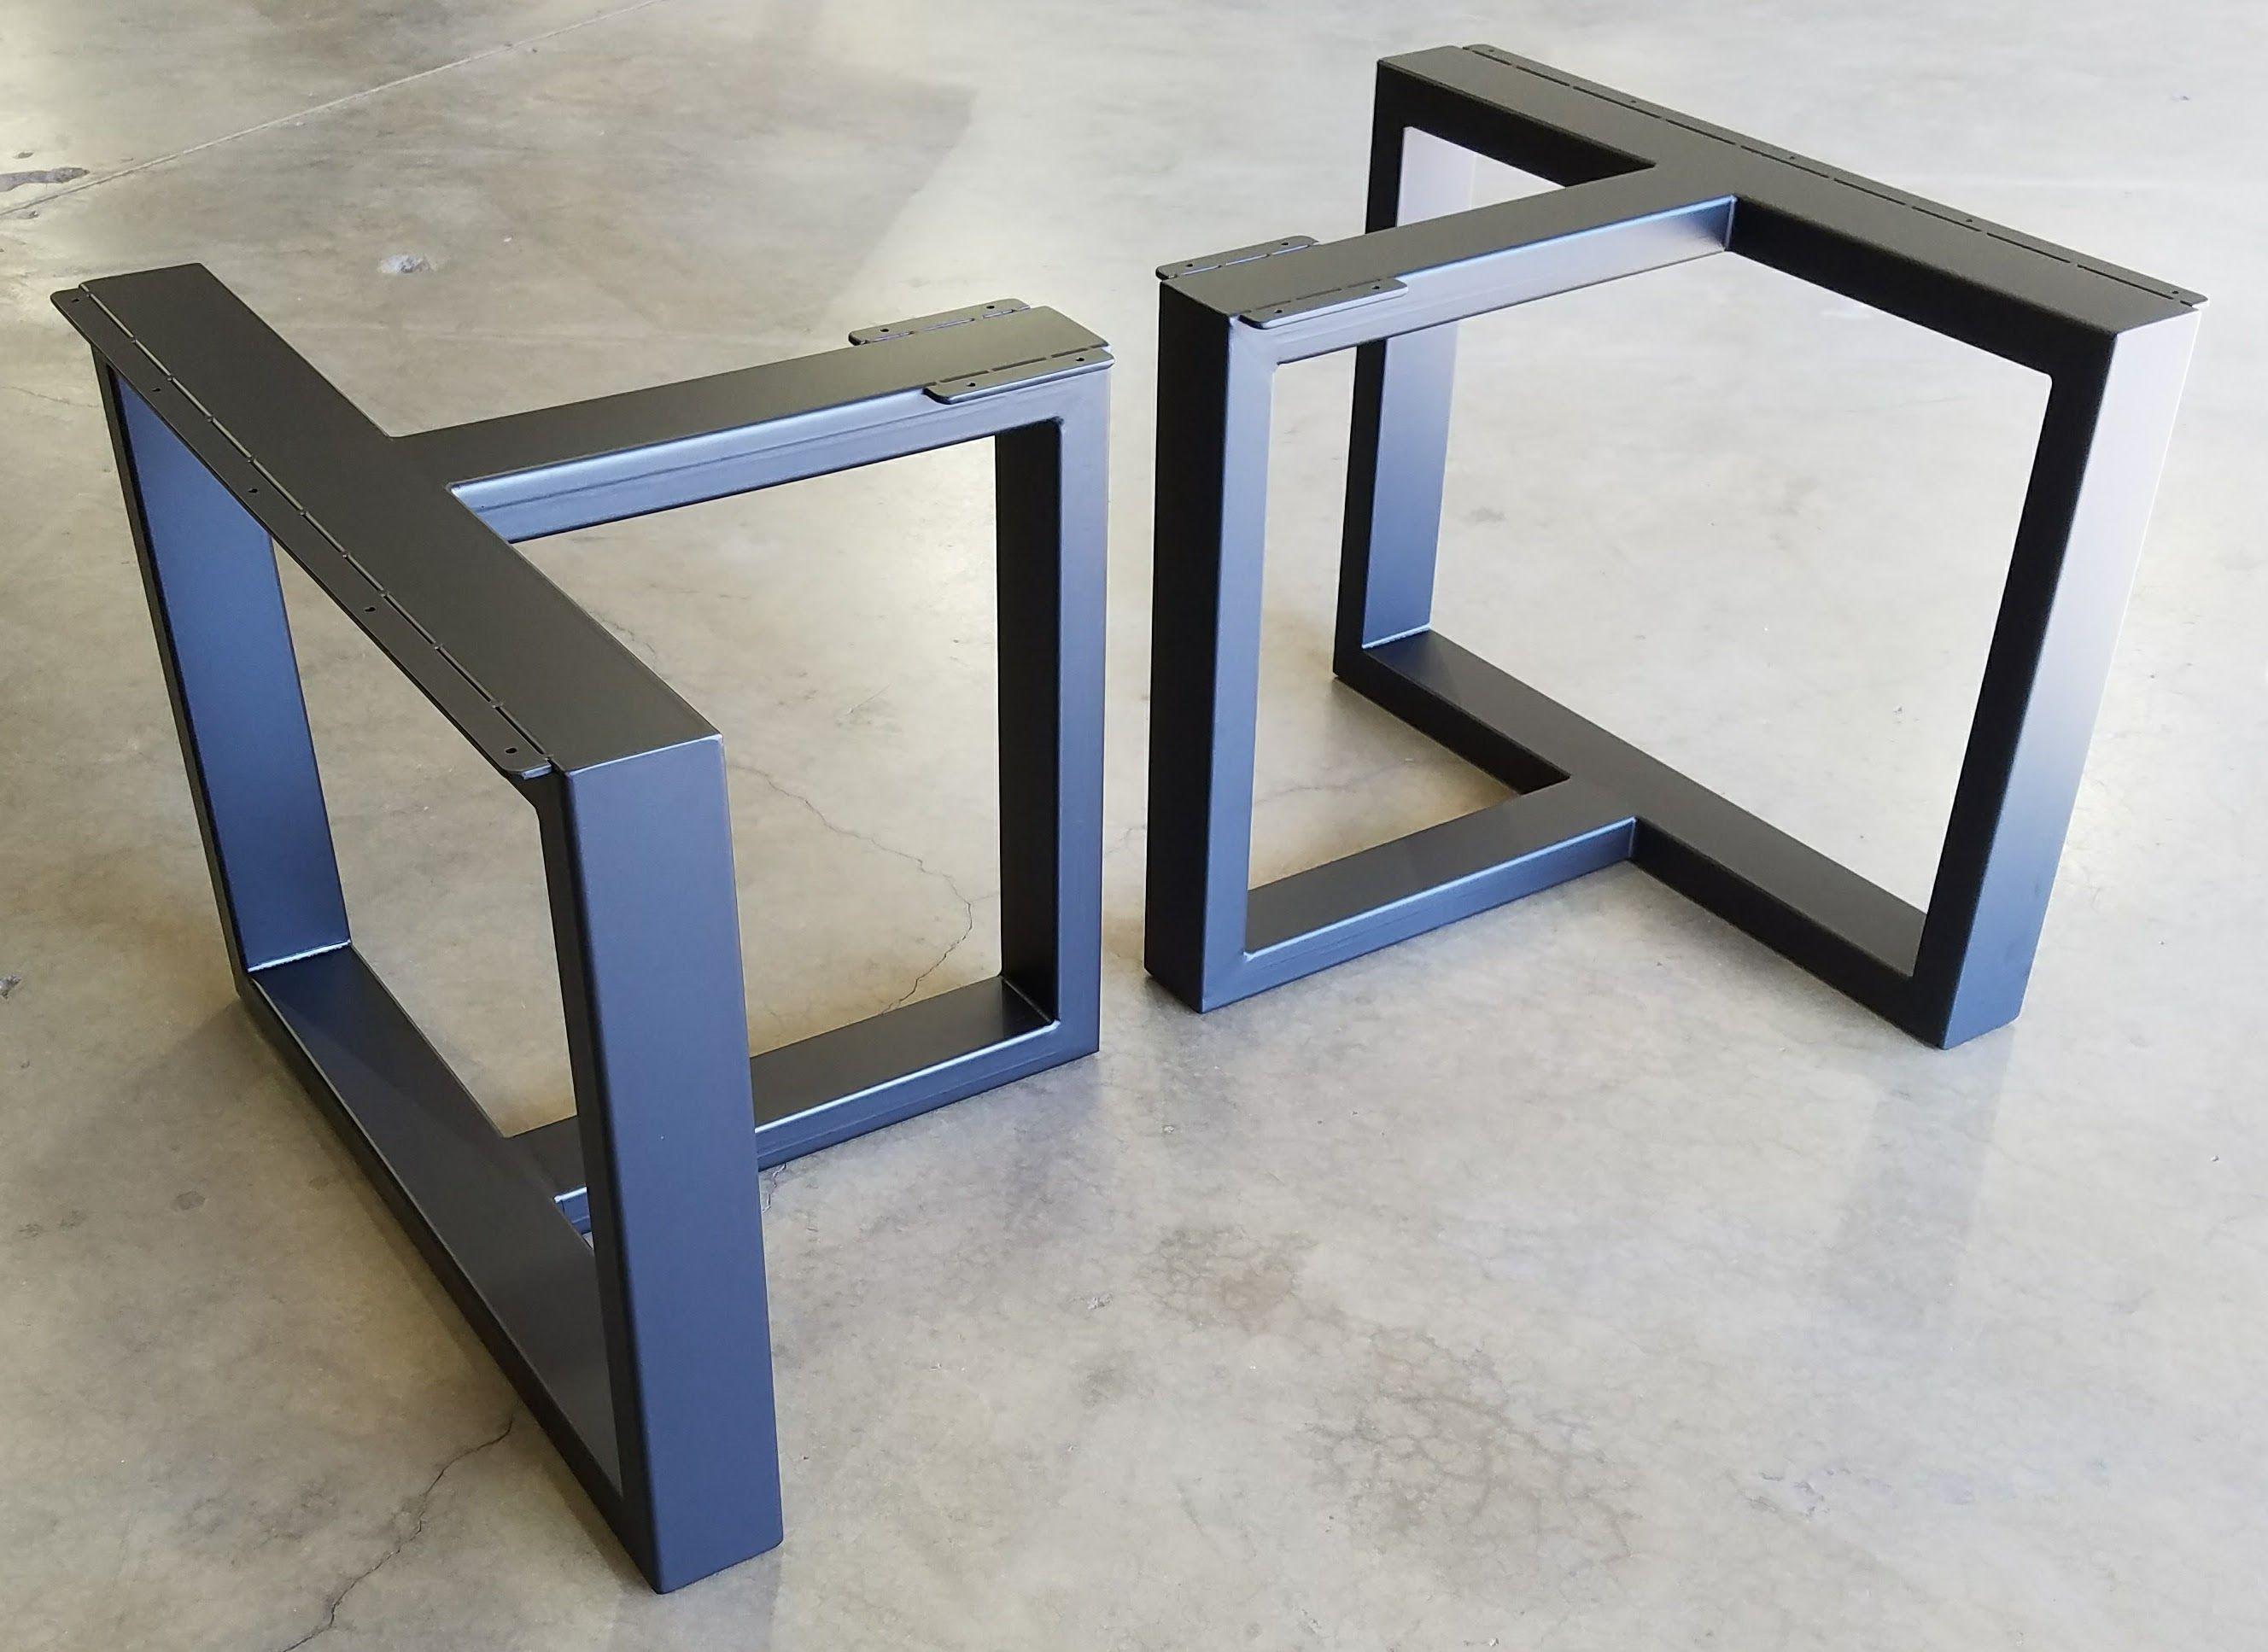 Custom Metal Table Legs by Urban Ironcraft